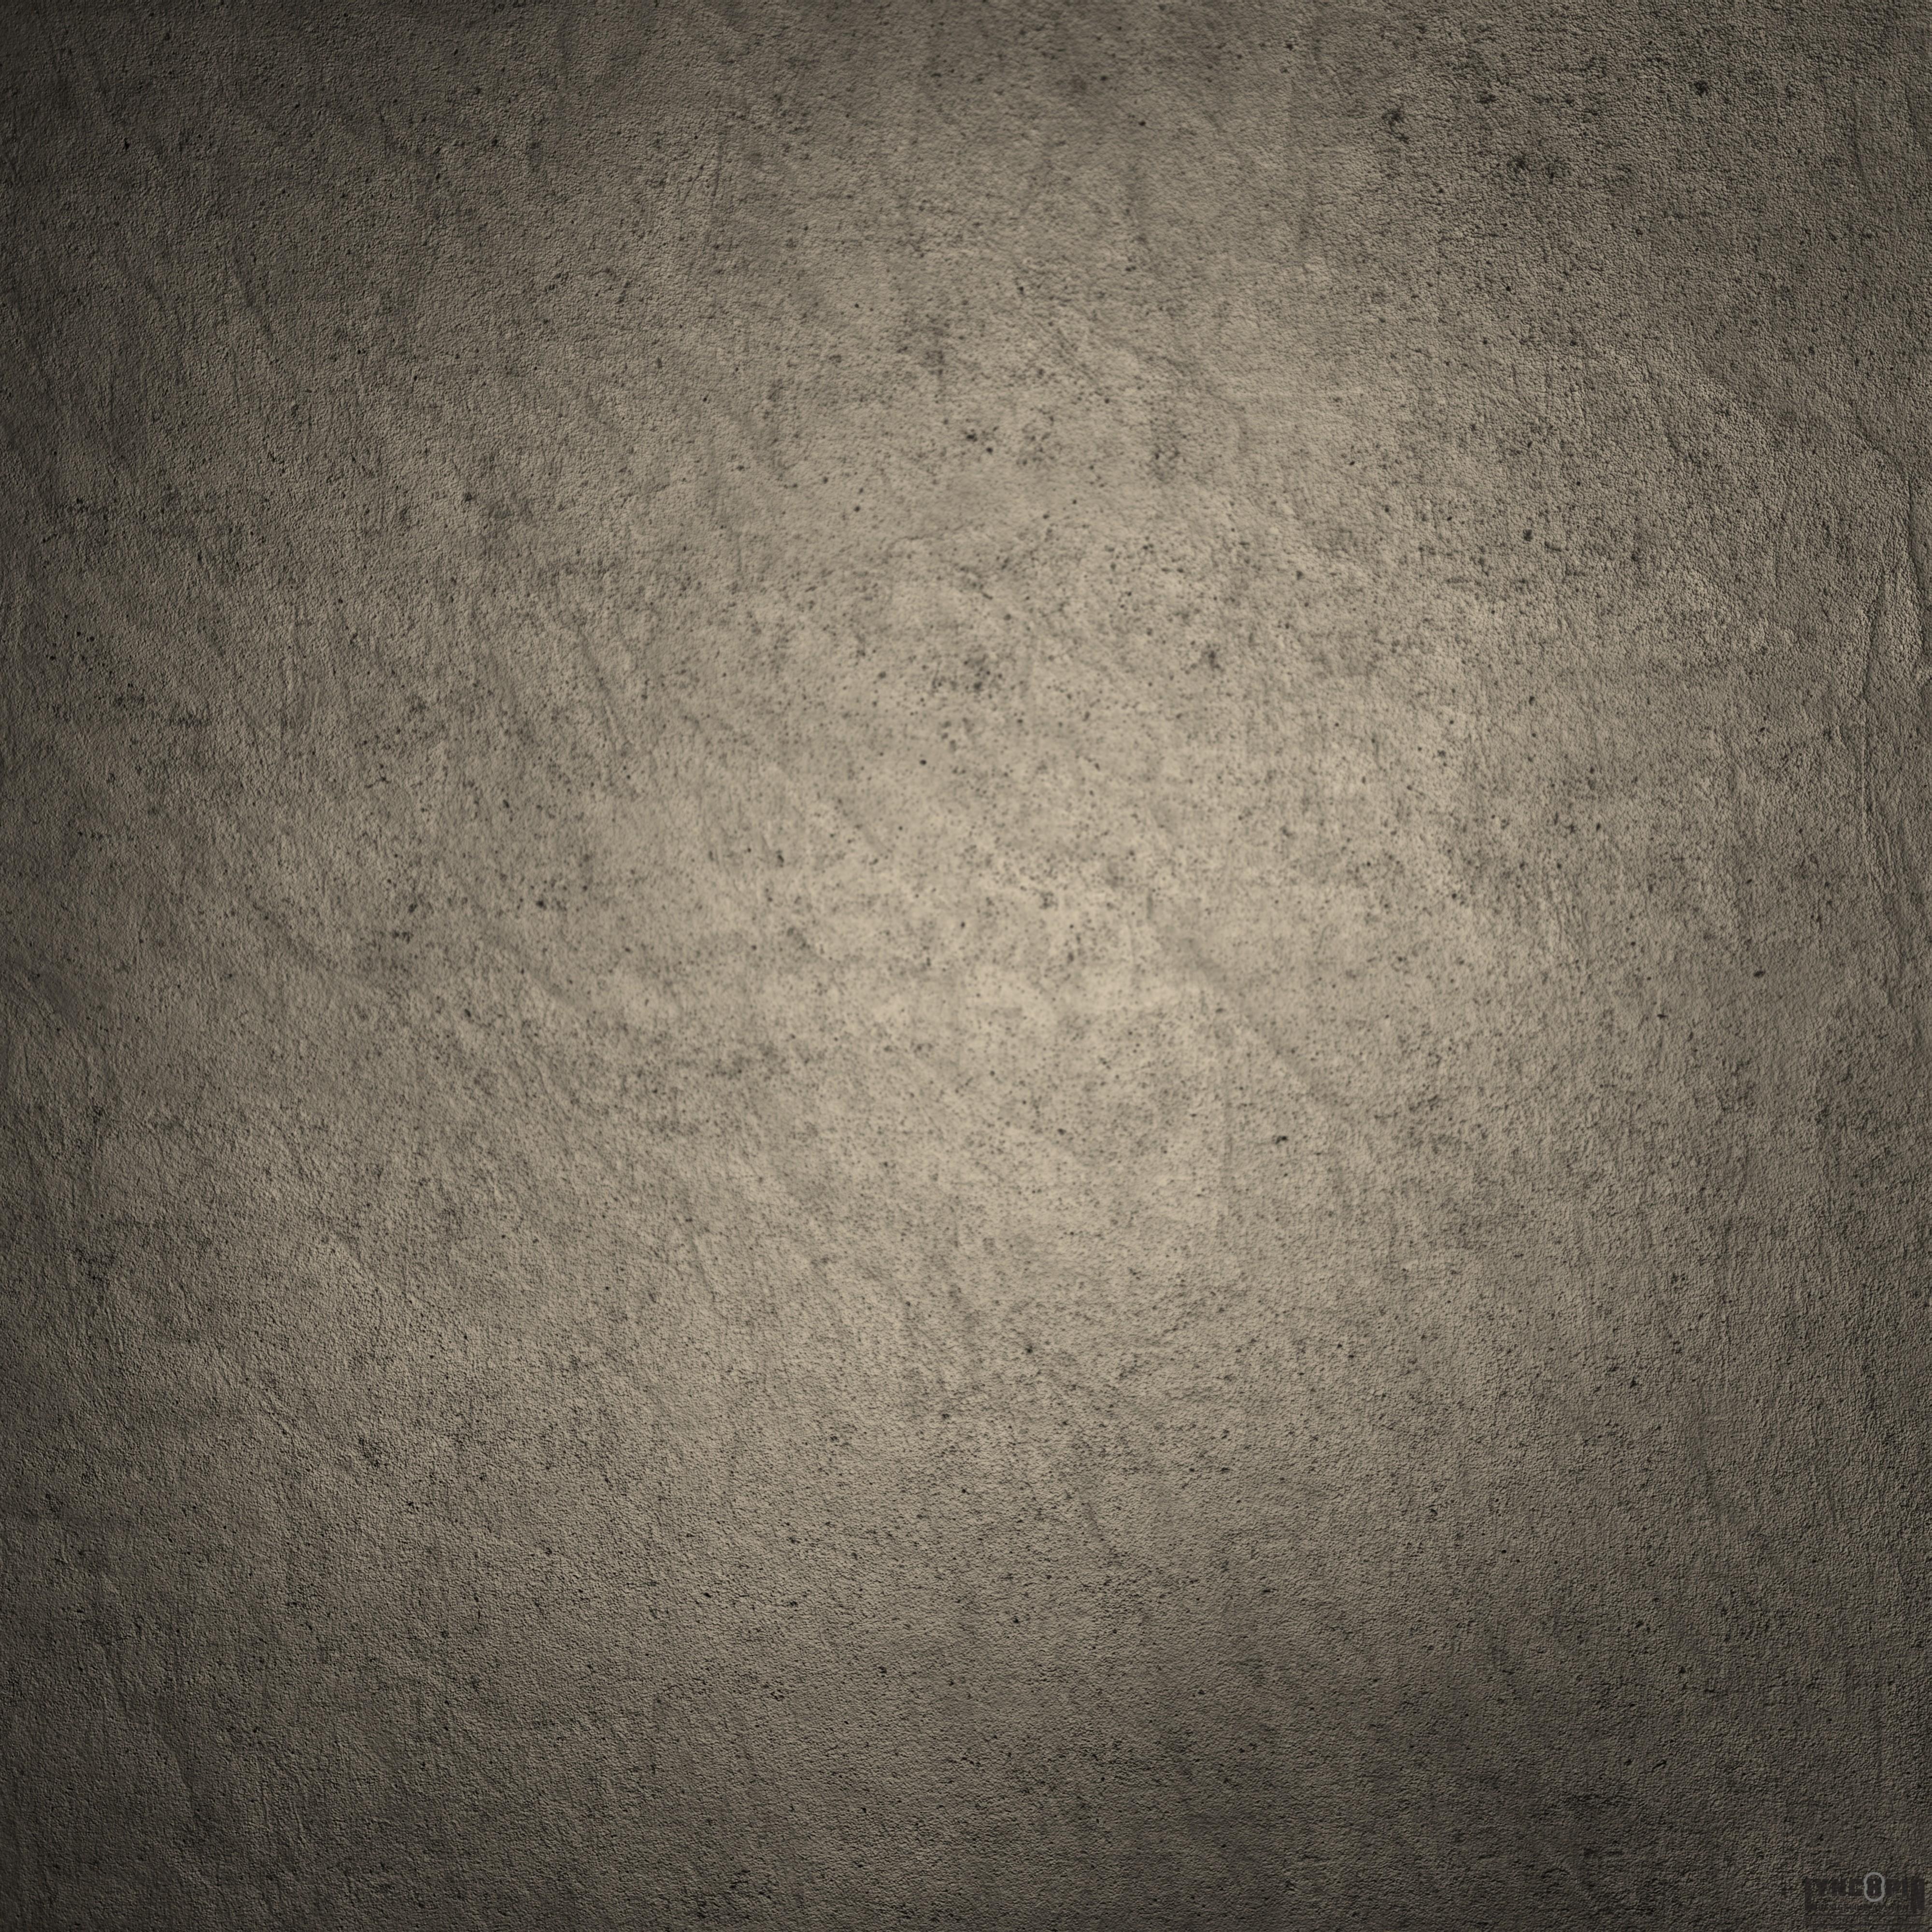 Grunge Vintage Texture Background Lynchpin Design Company